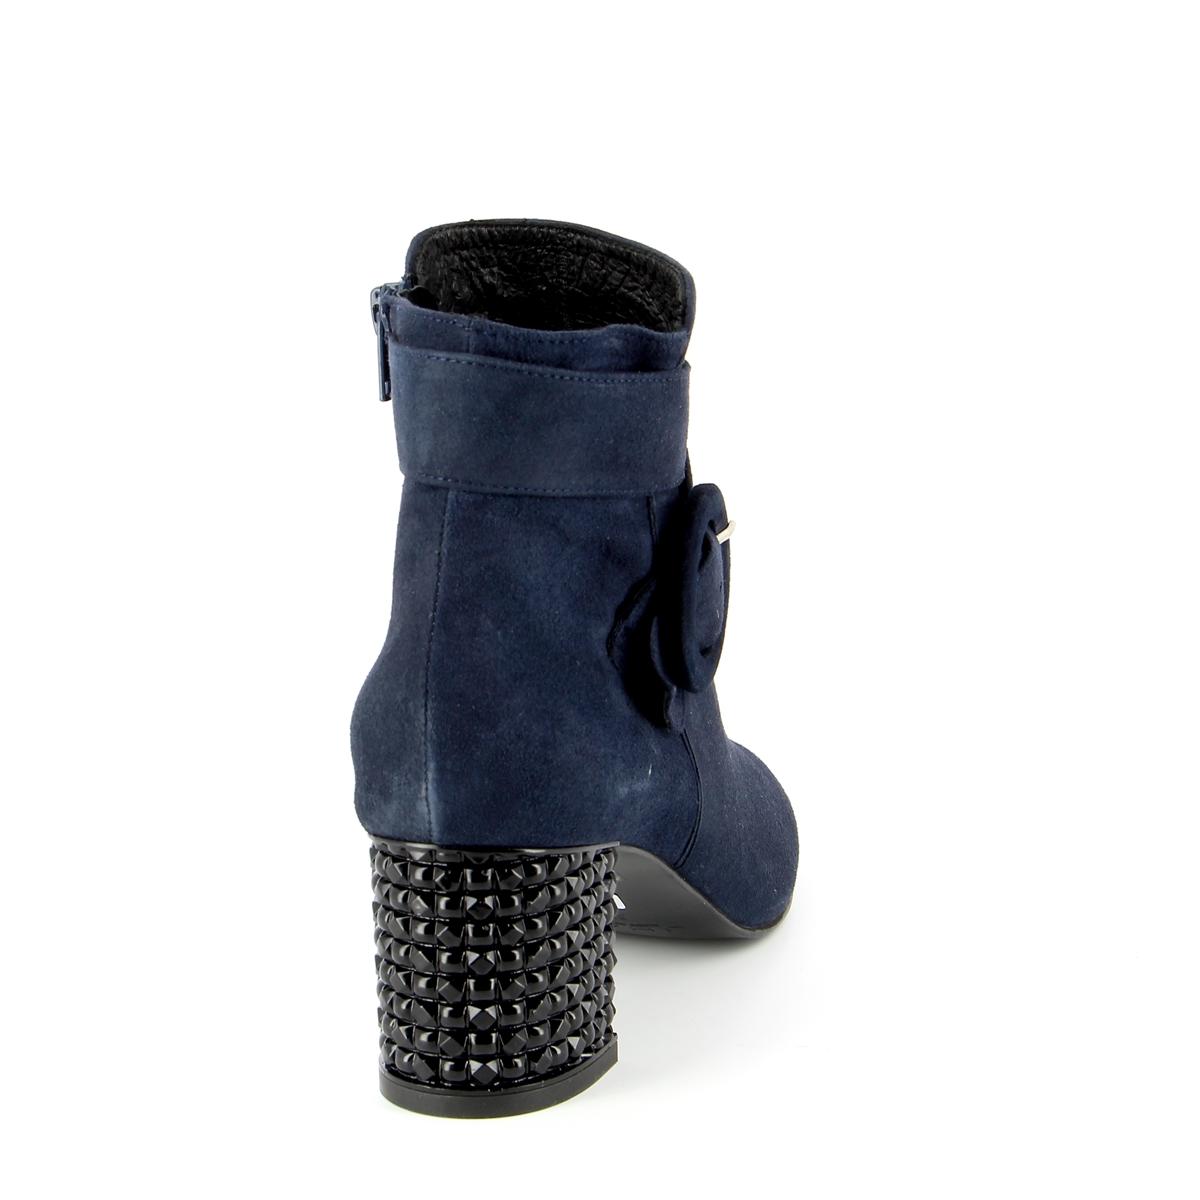 J'hay Boots blauw